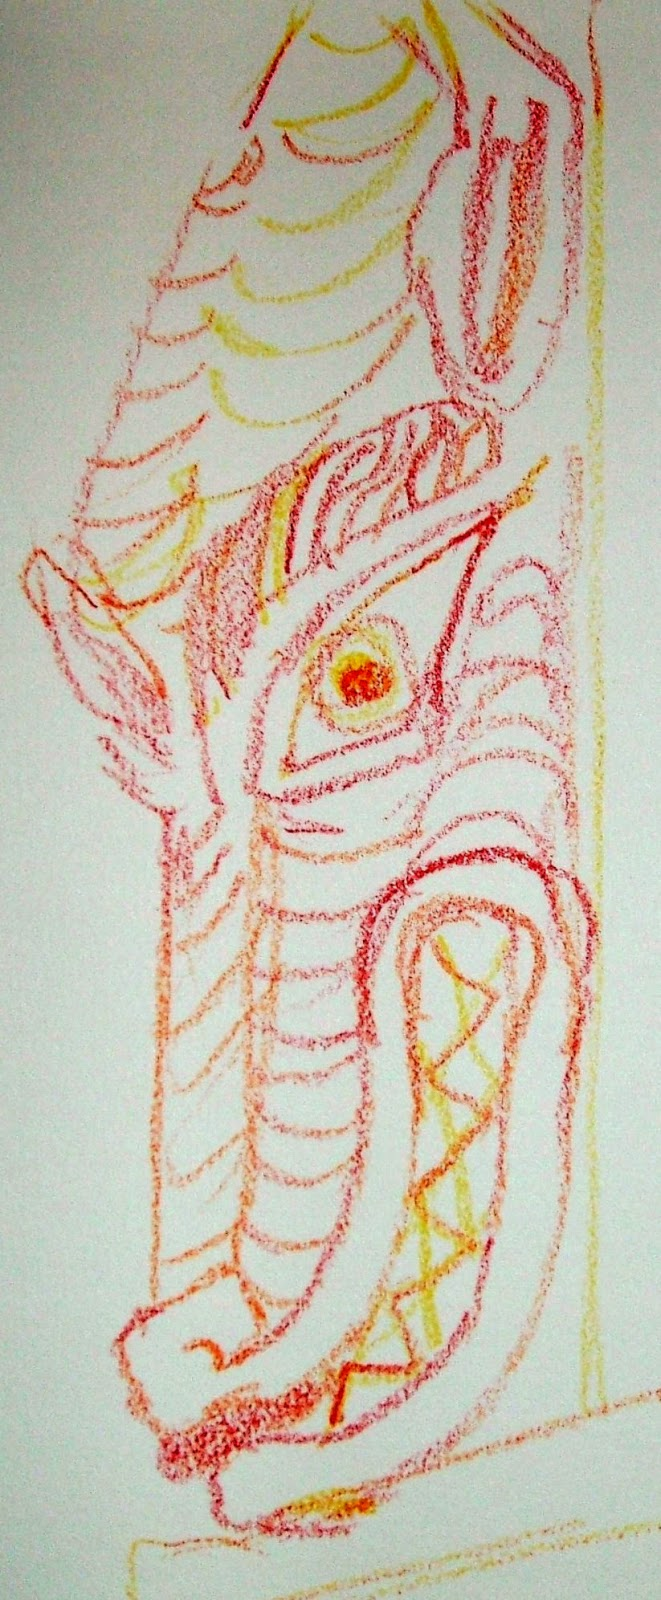 Norman dragon carving at Leonard Stanley